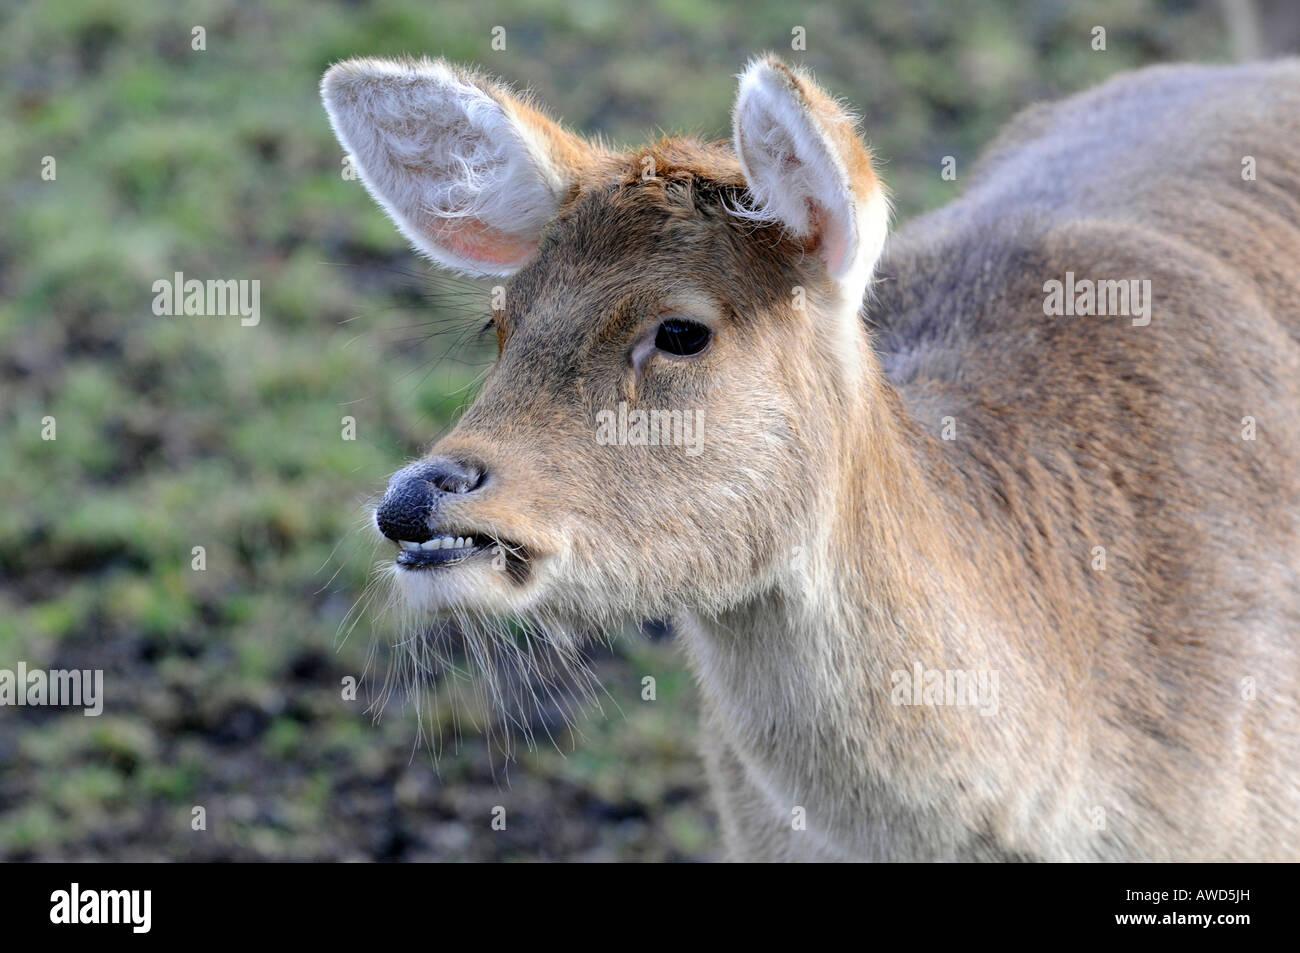 Barasingha Deer (Rucervus duvaucelii, Cervus duvaucelii) at a zoo in Bavaria, Germany, Europe Stock Photo